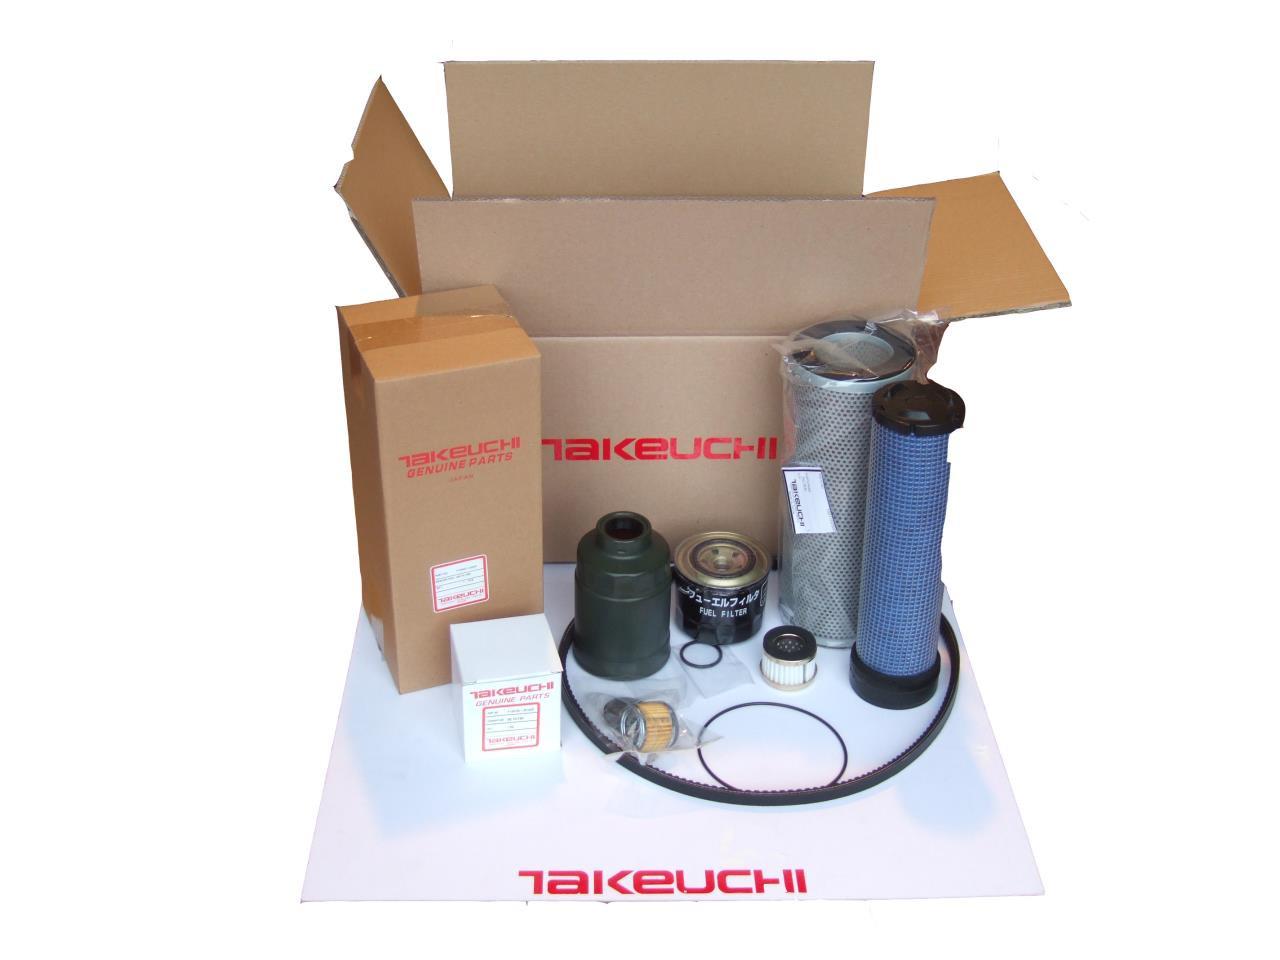 Takeuchi TB285 filtersæt